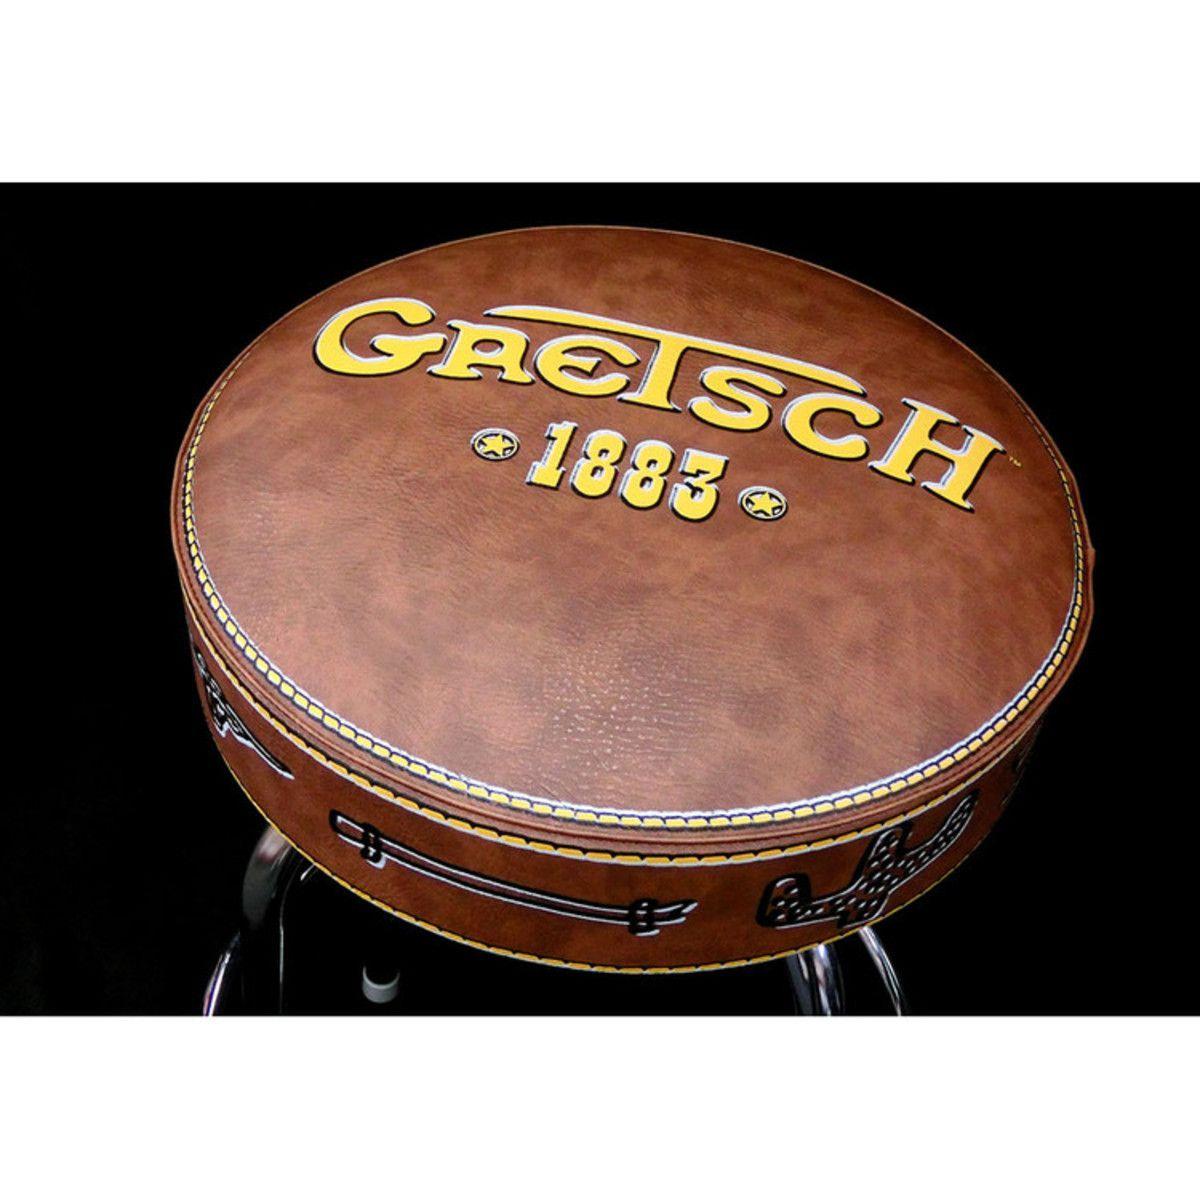 Banco Fender Barstool 24in Gretsch 1883